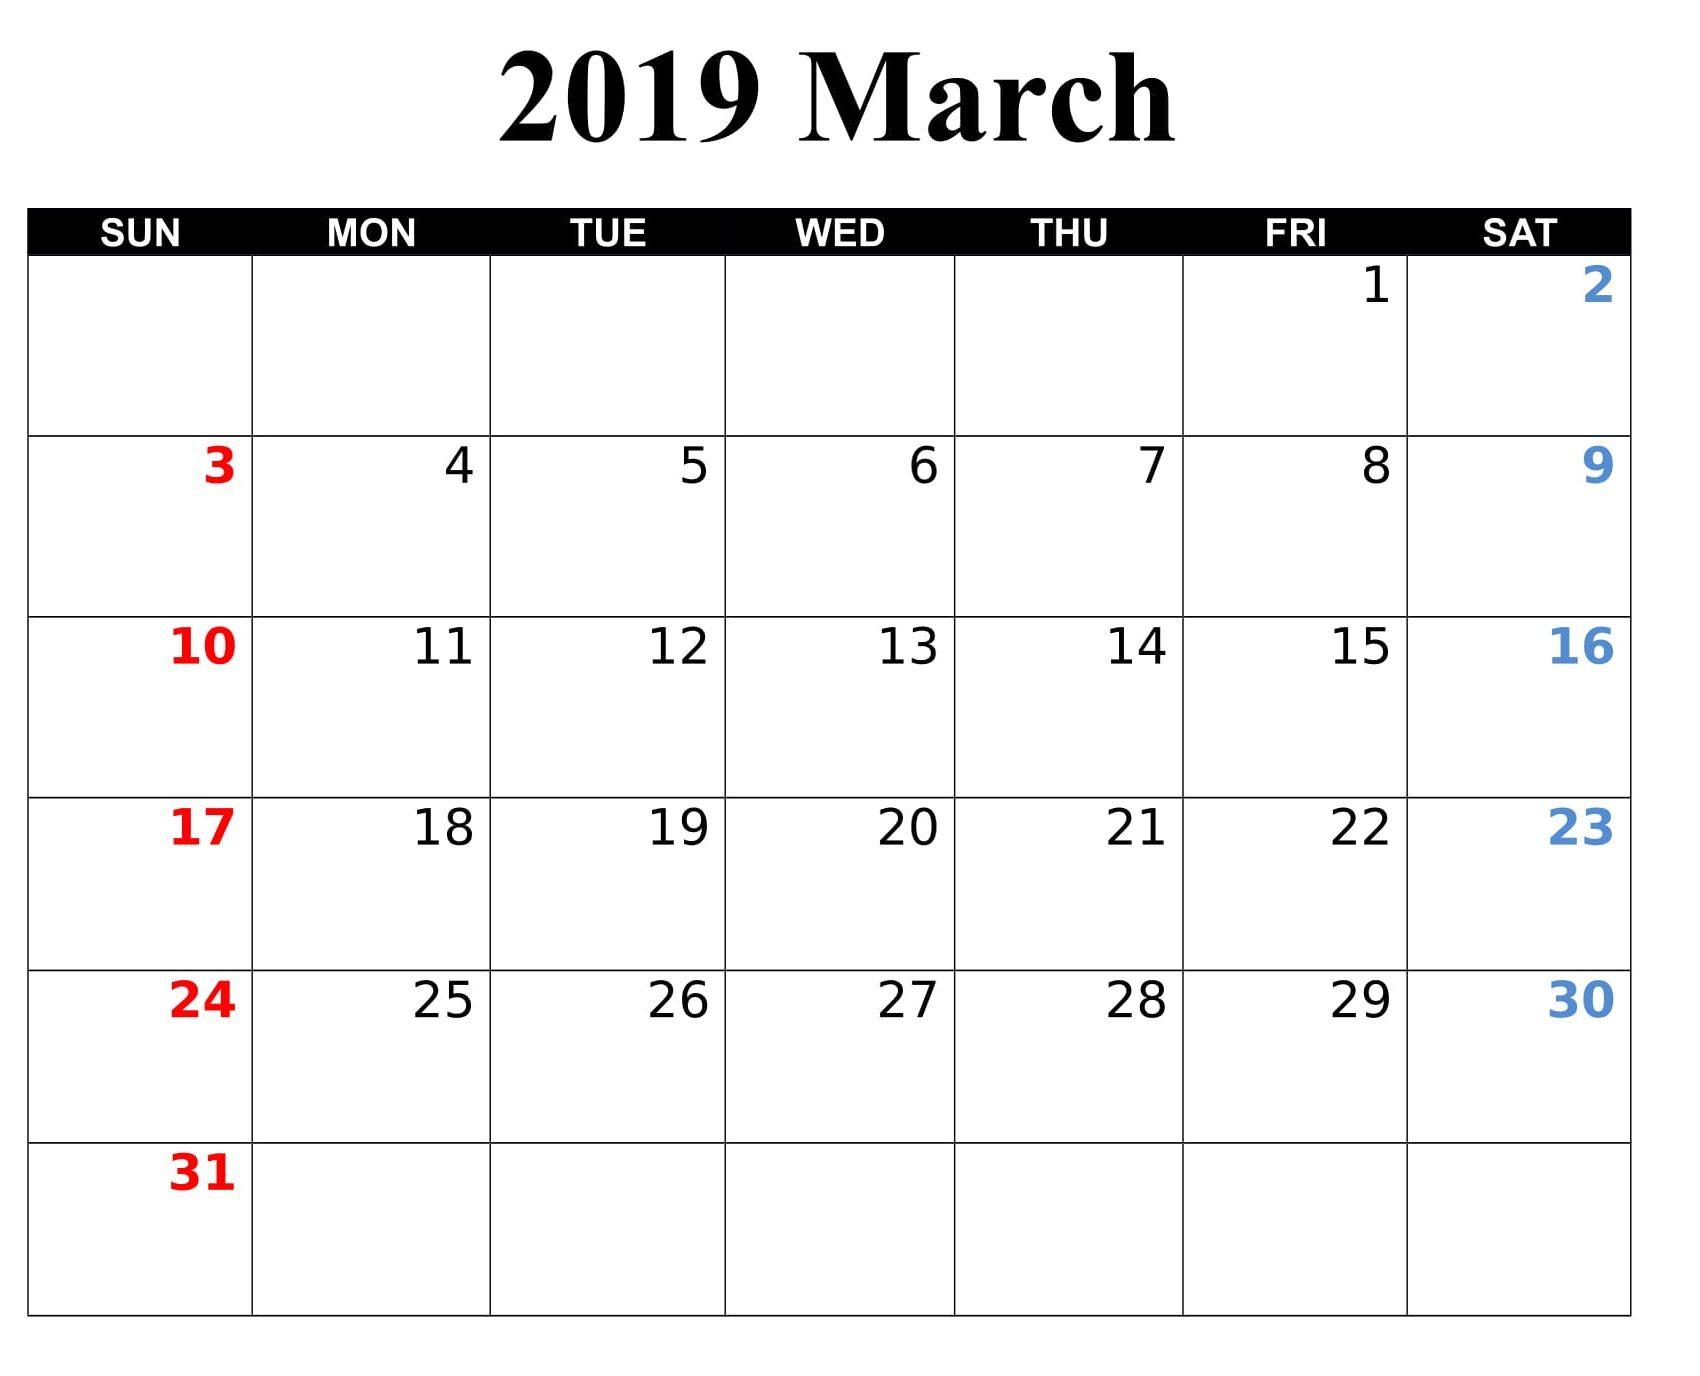 March 2019 Calendar Online With Holidays 2019 Calendar Online